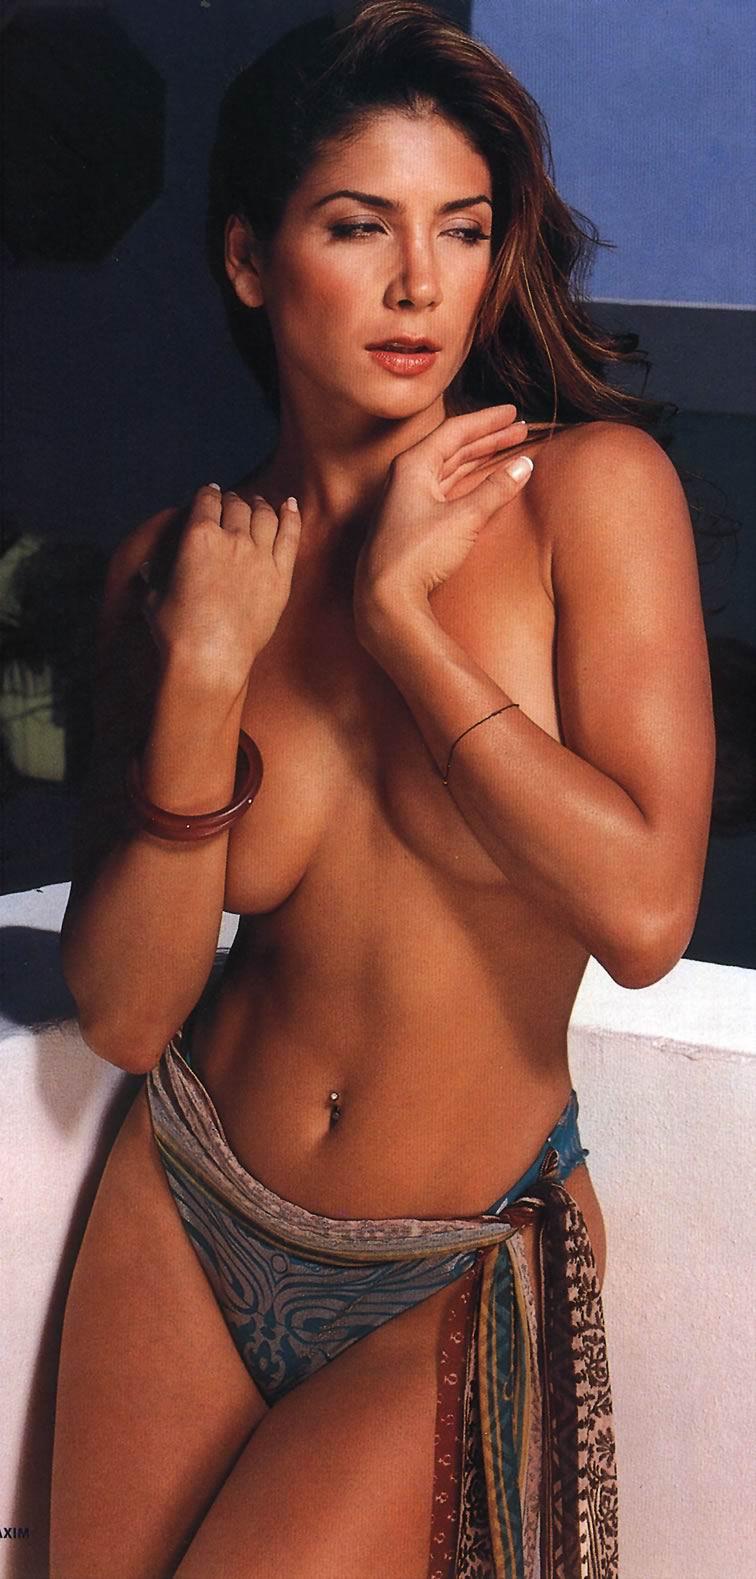 Kaylee heart interracial